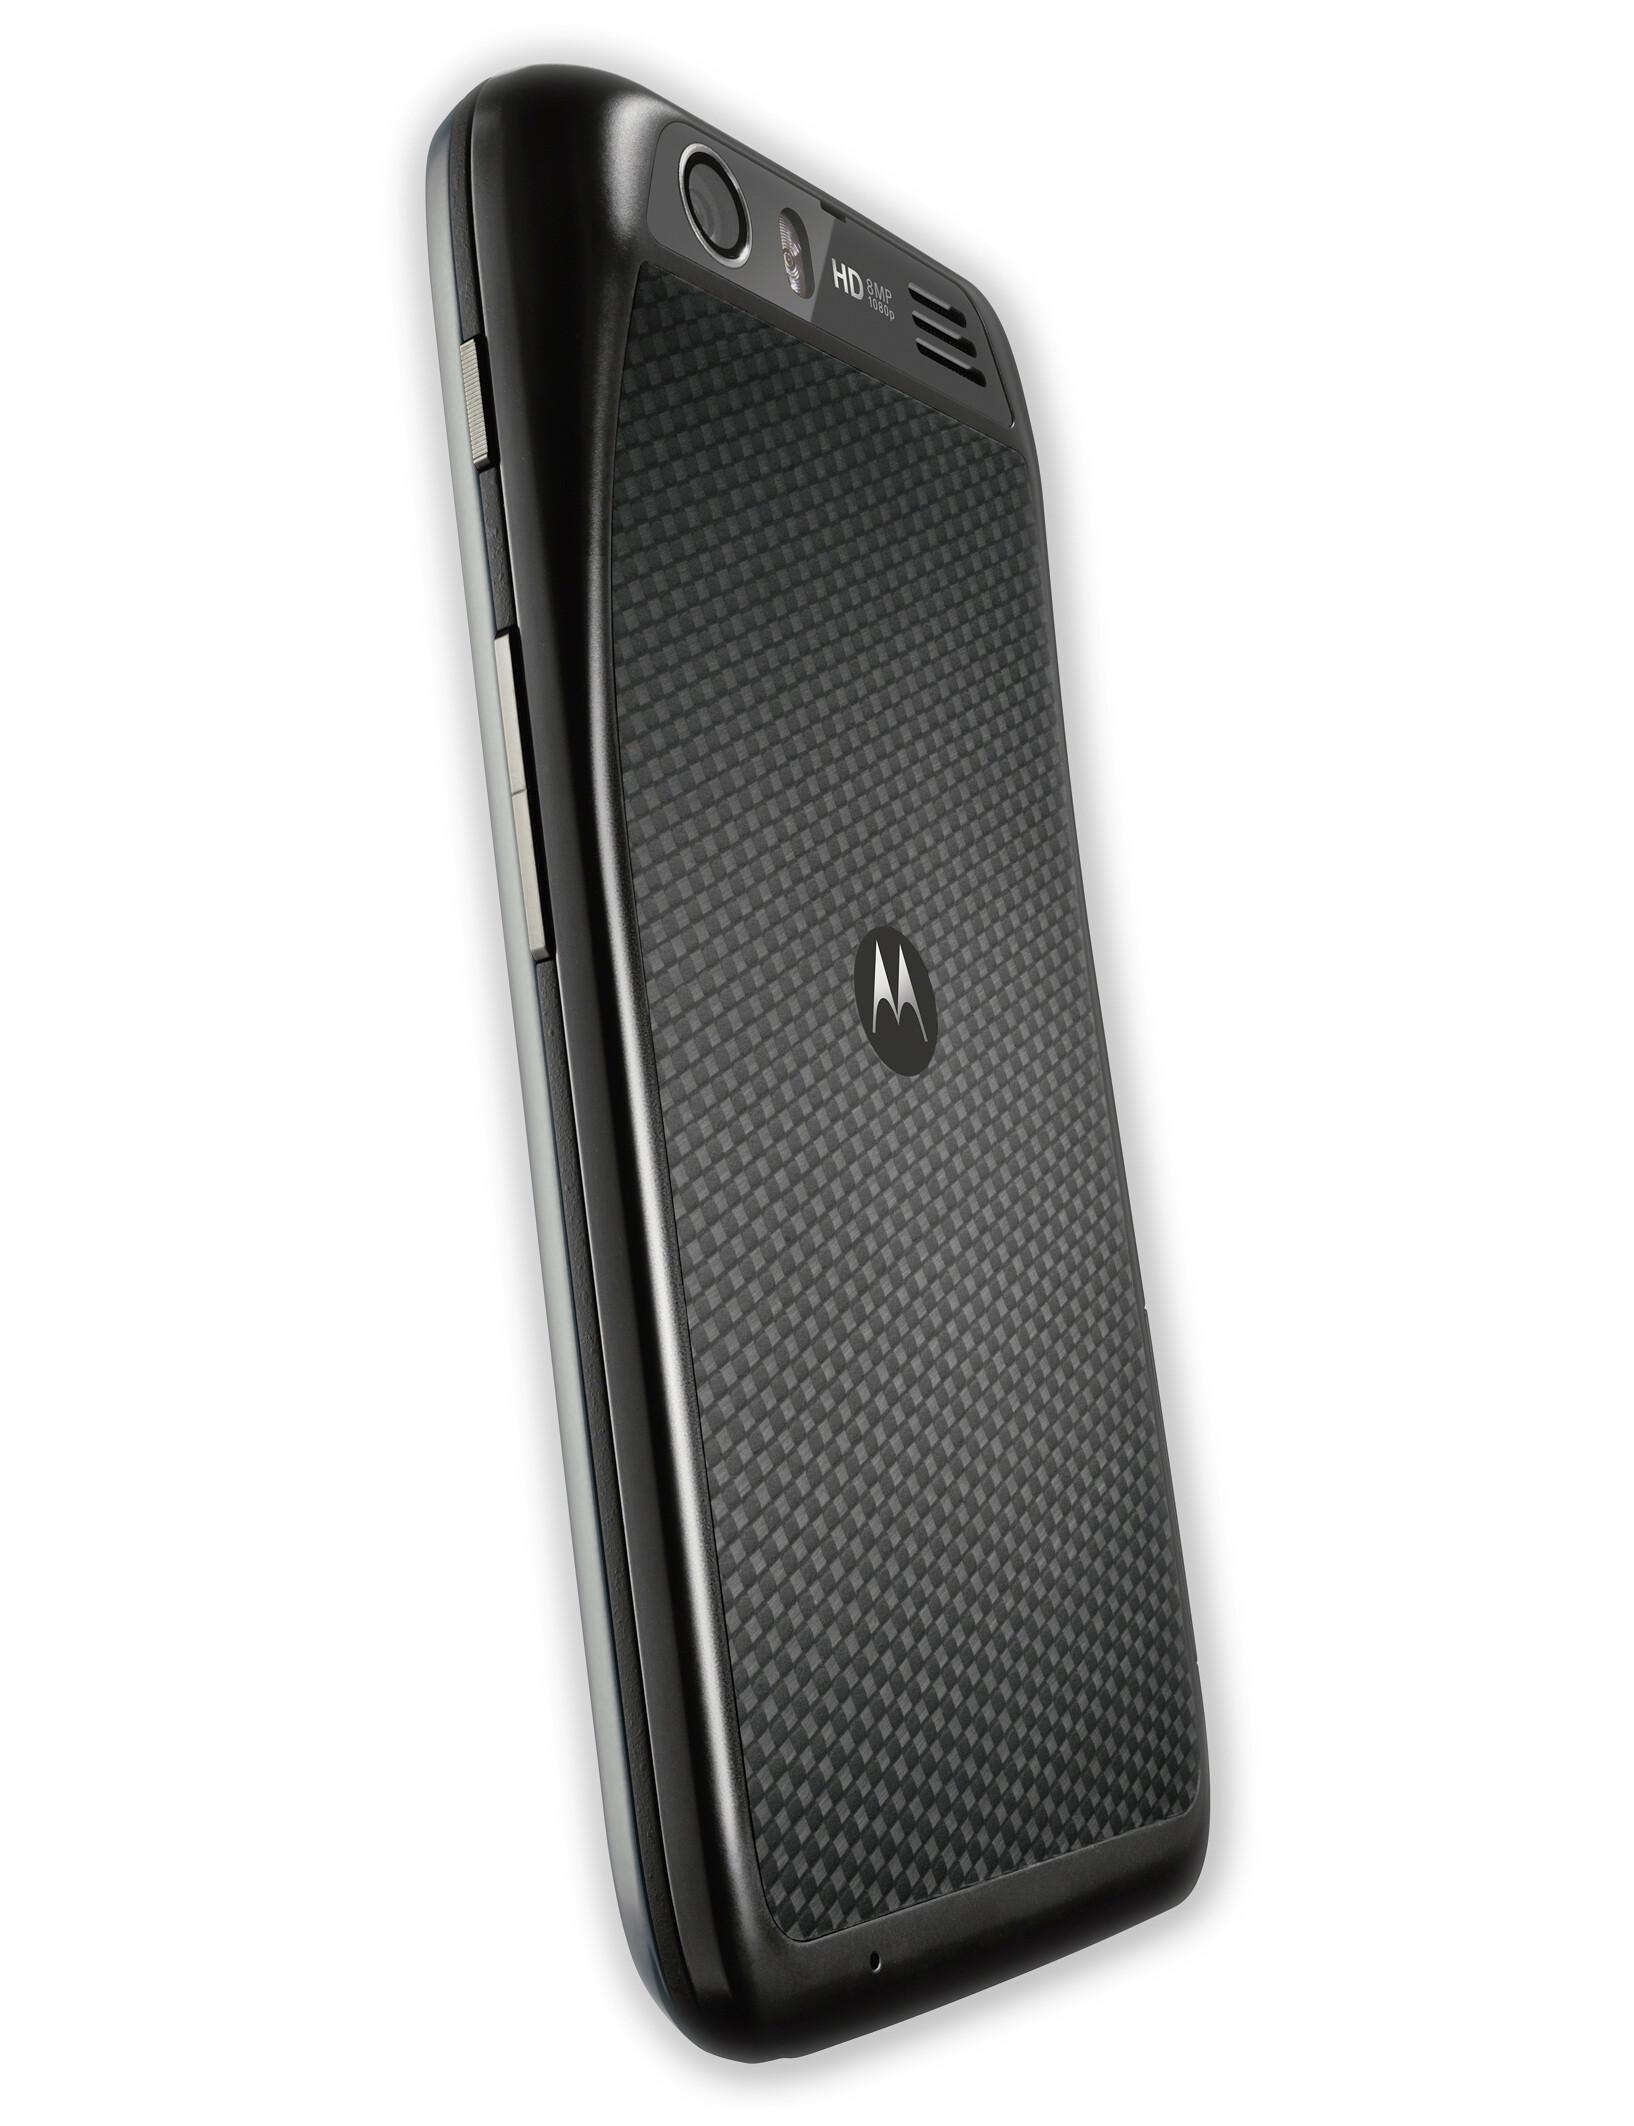 motorola atrix hd specs Motorola Atrix HD 4G Motorola Atrix HD LTE Review